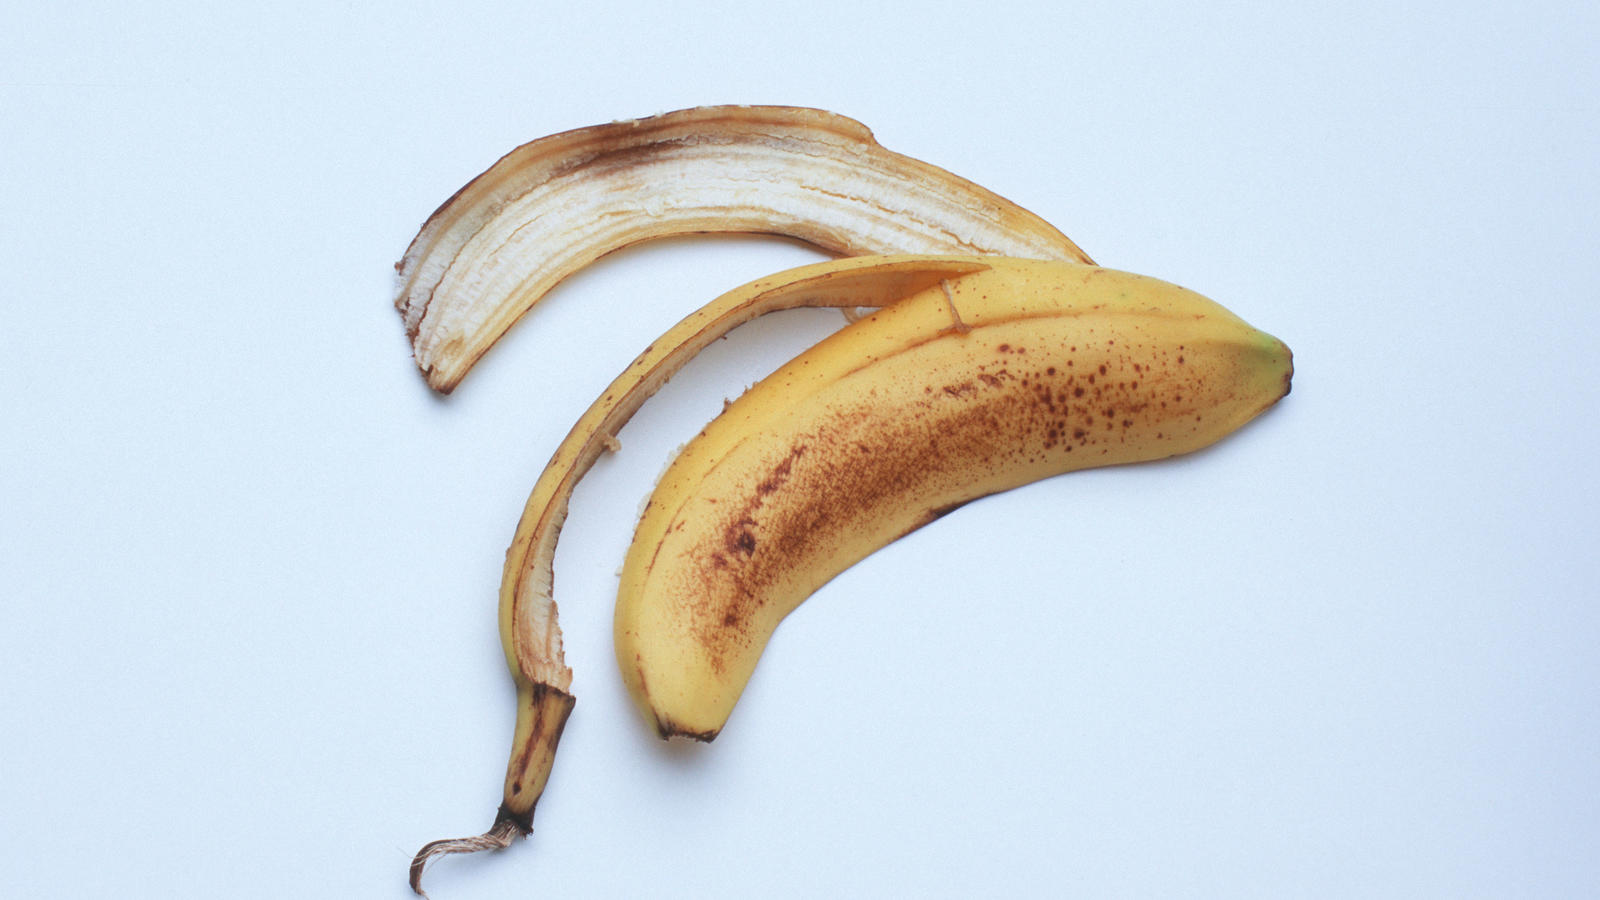 schon gewusst bananenschalen eigenen sich prima als d nger f r rosen